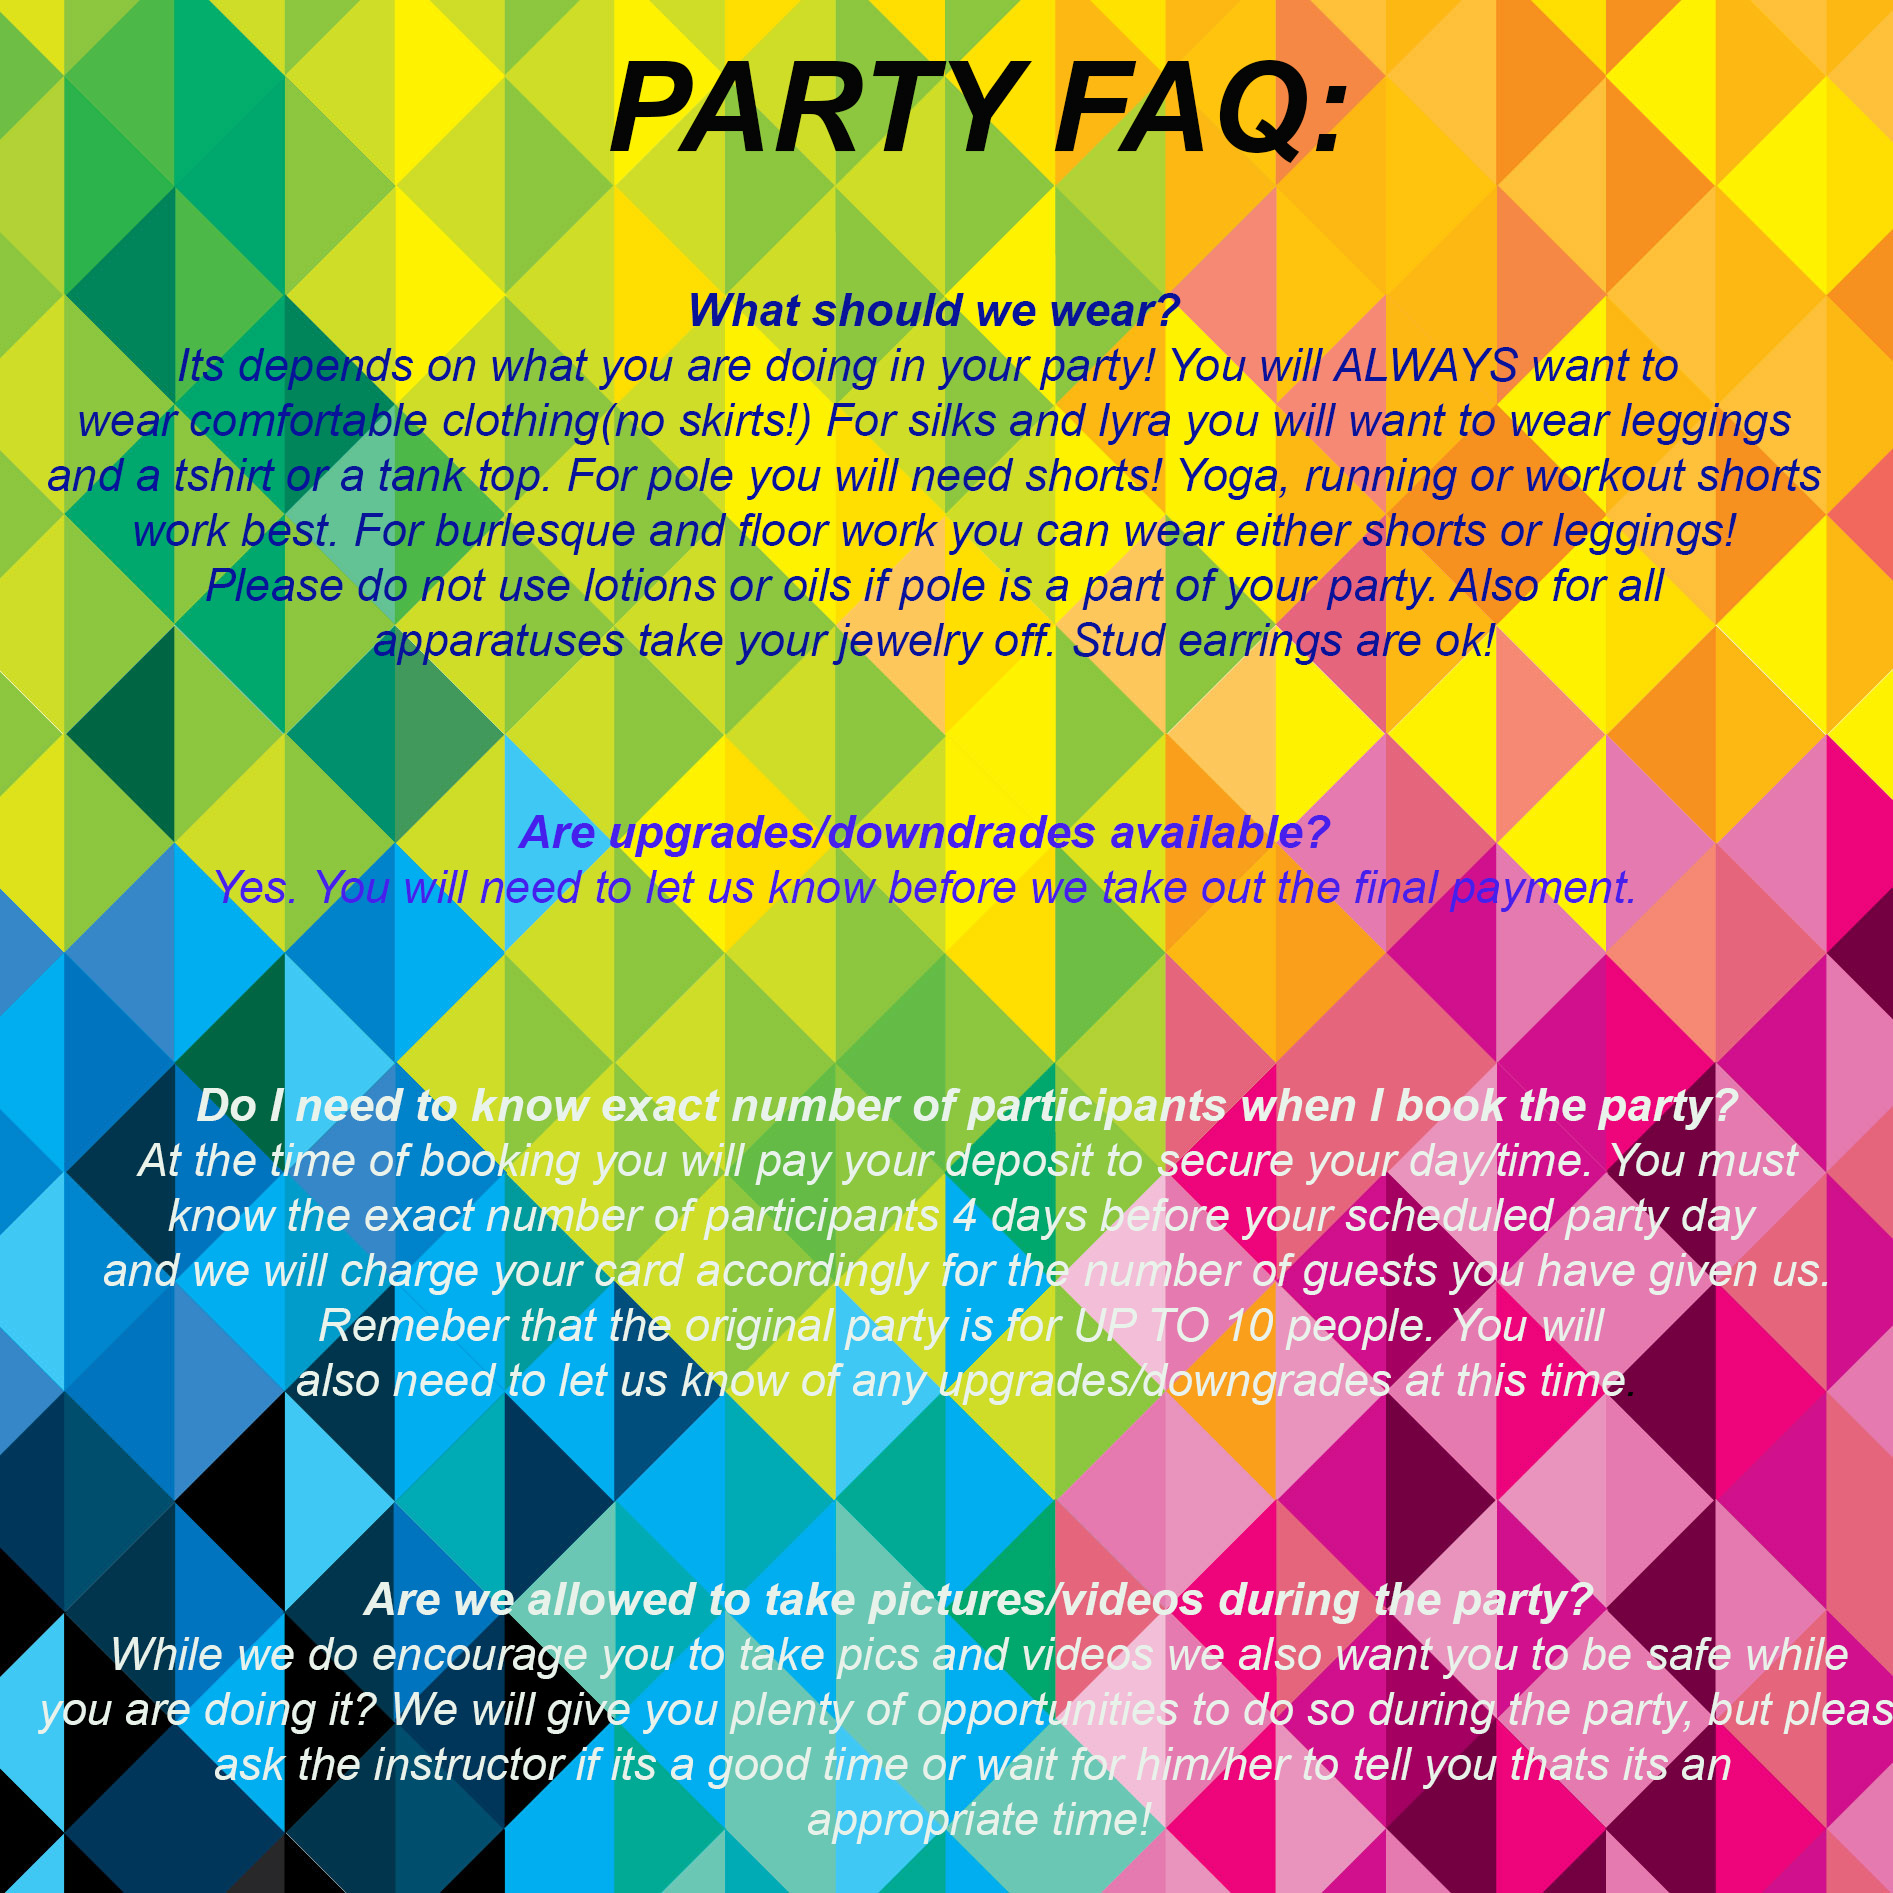 partyfaq1.jpg